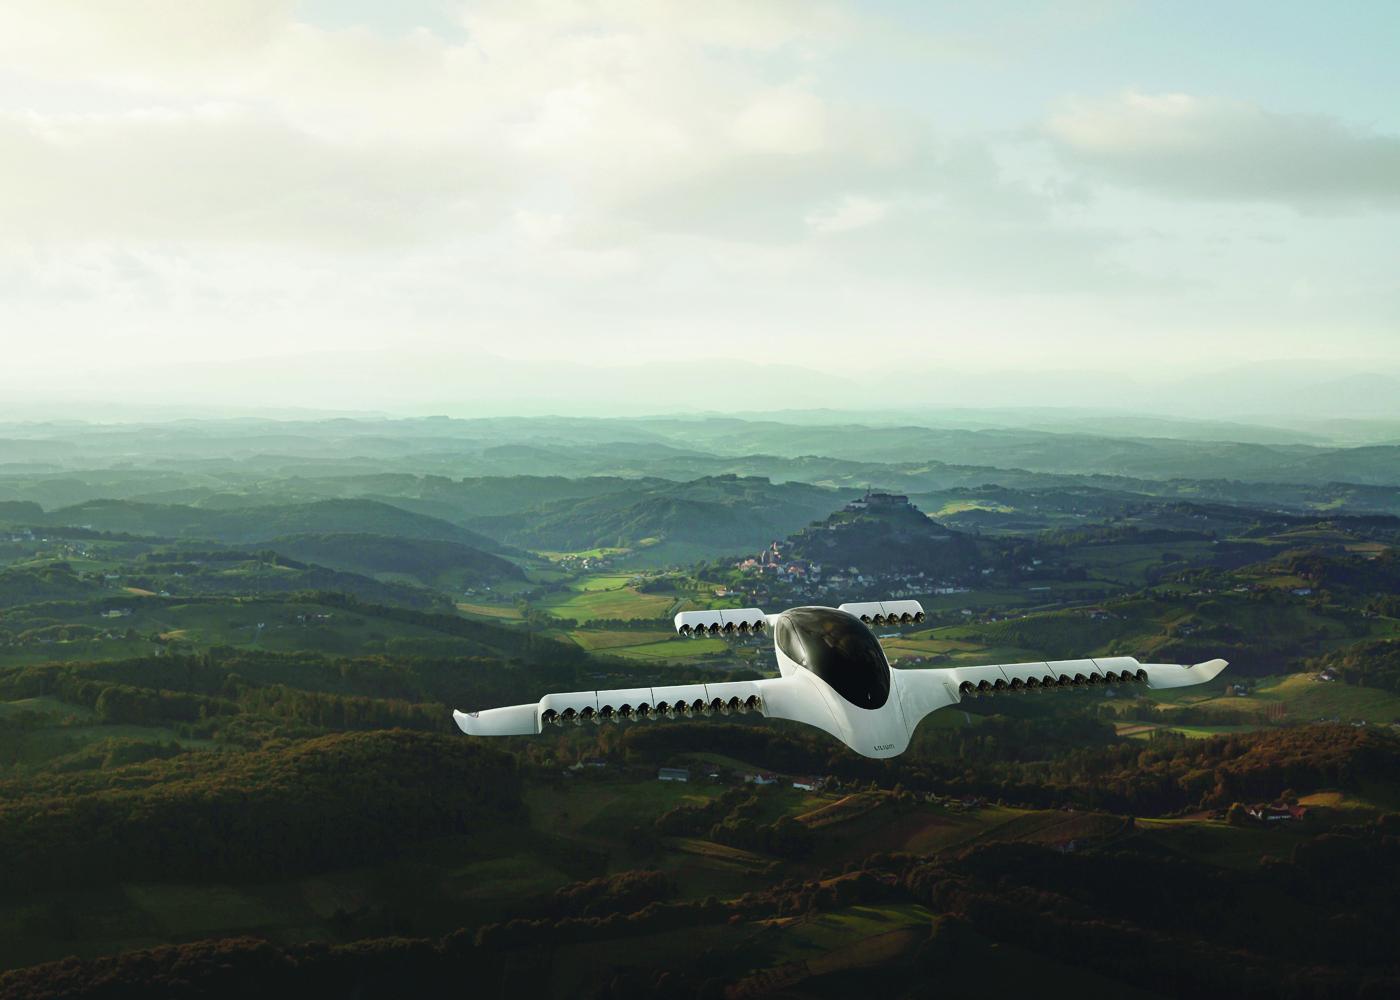 Lilium Jet eVTOL - EASA certification